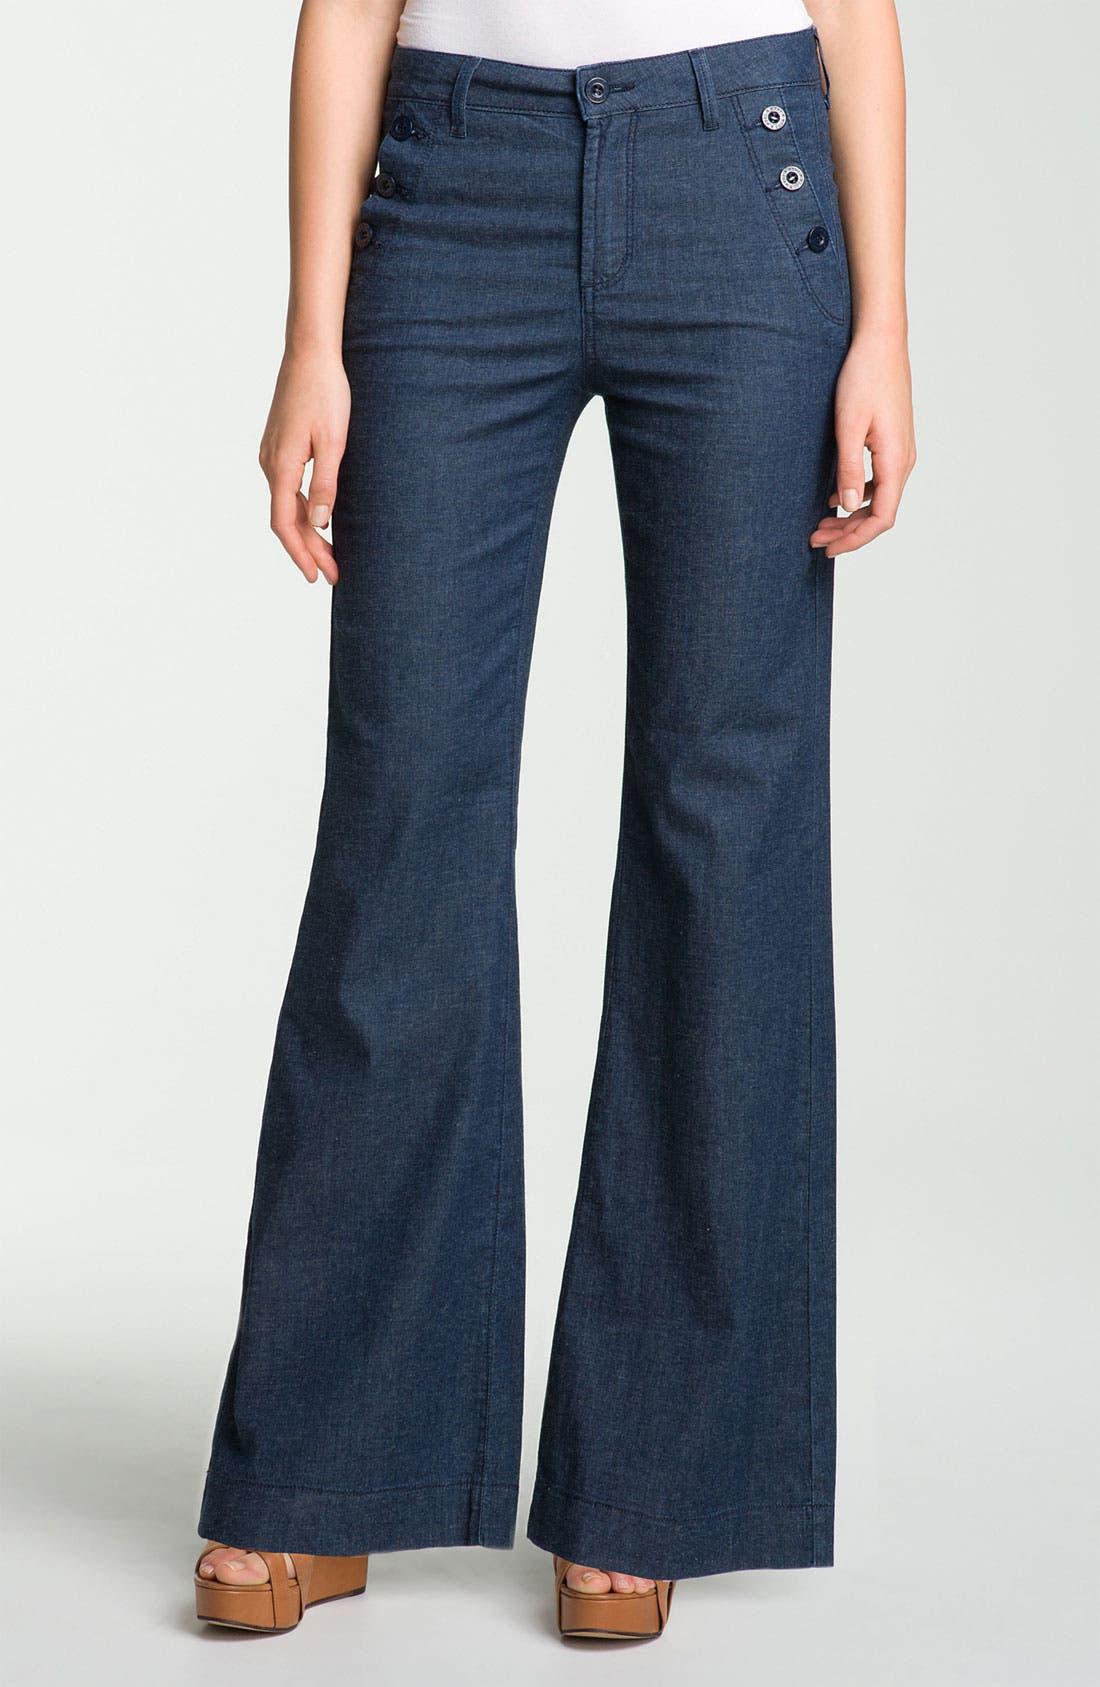 Alternate Image 1 Selected - NYDJ 'Tina Sailor' Wide Leg Jeans (Petite)